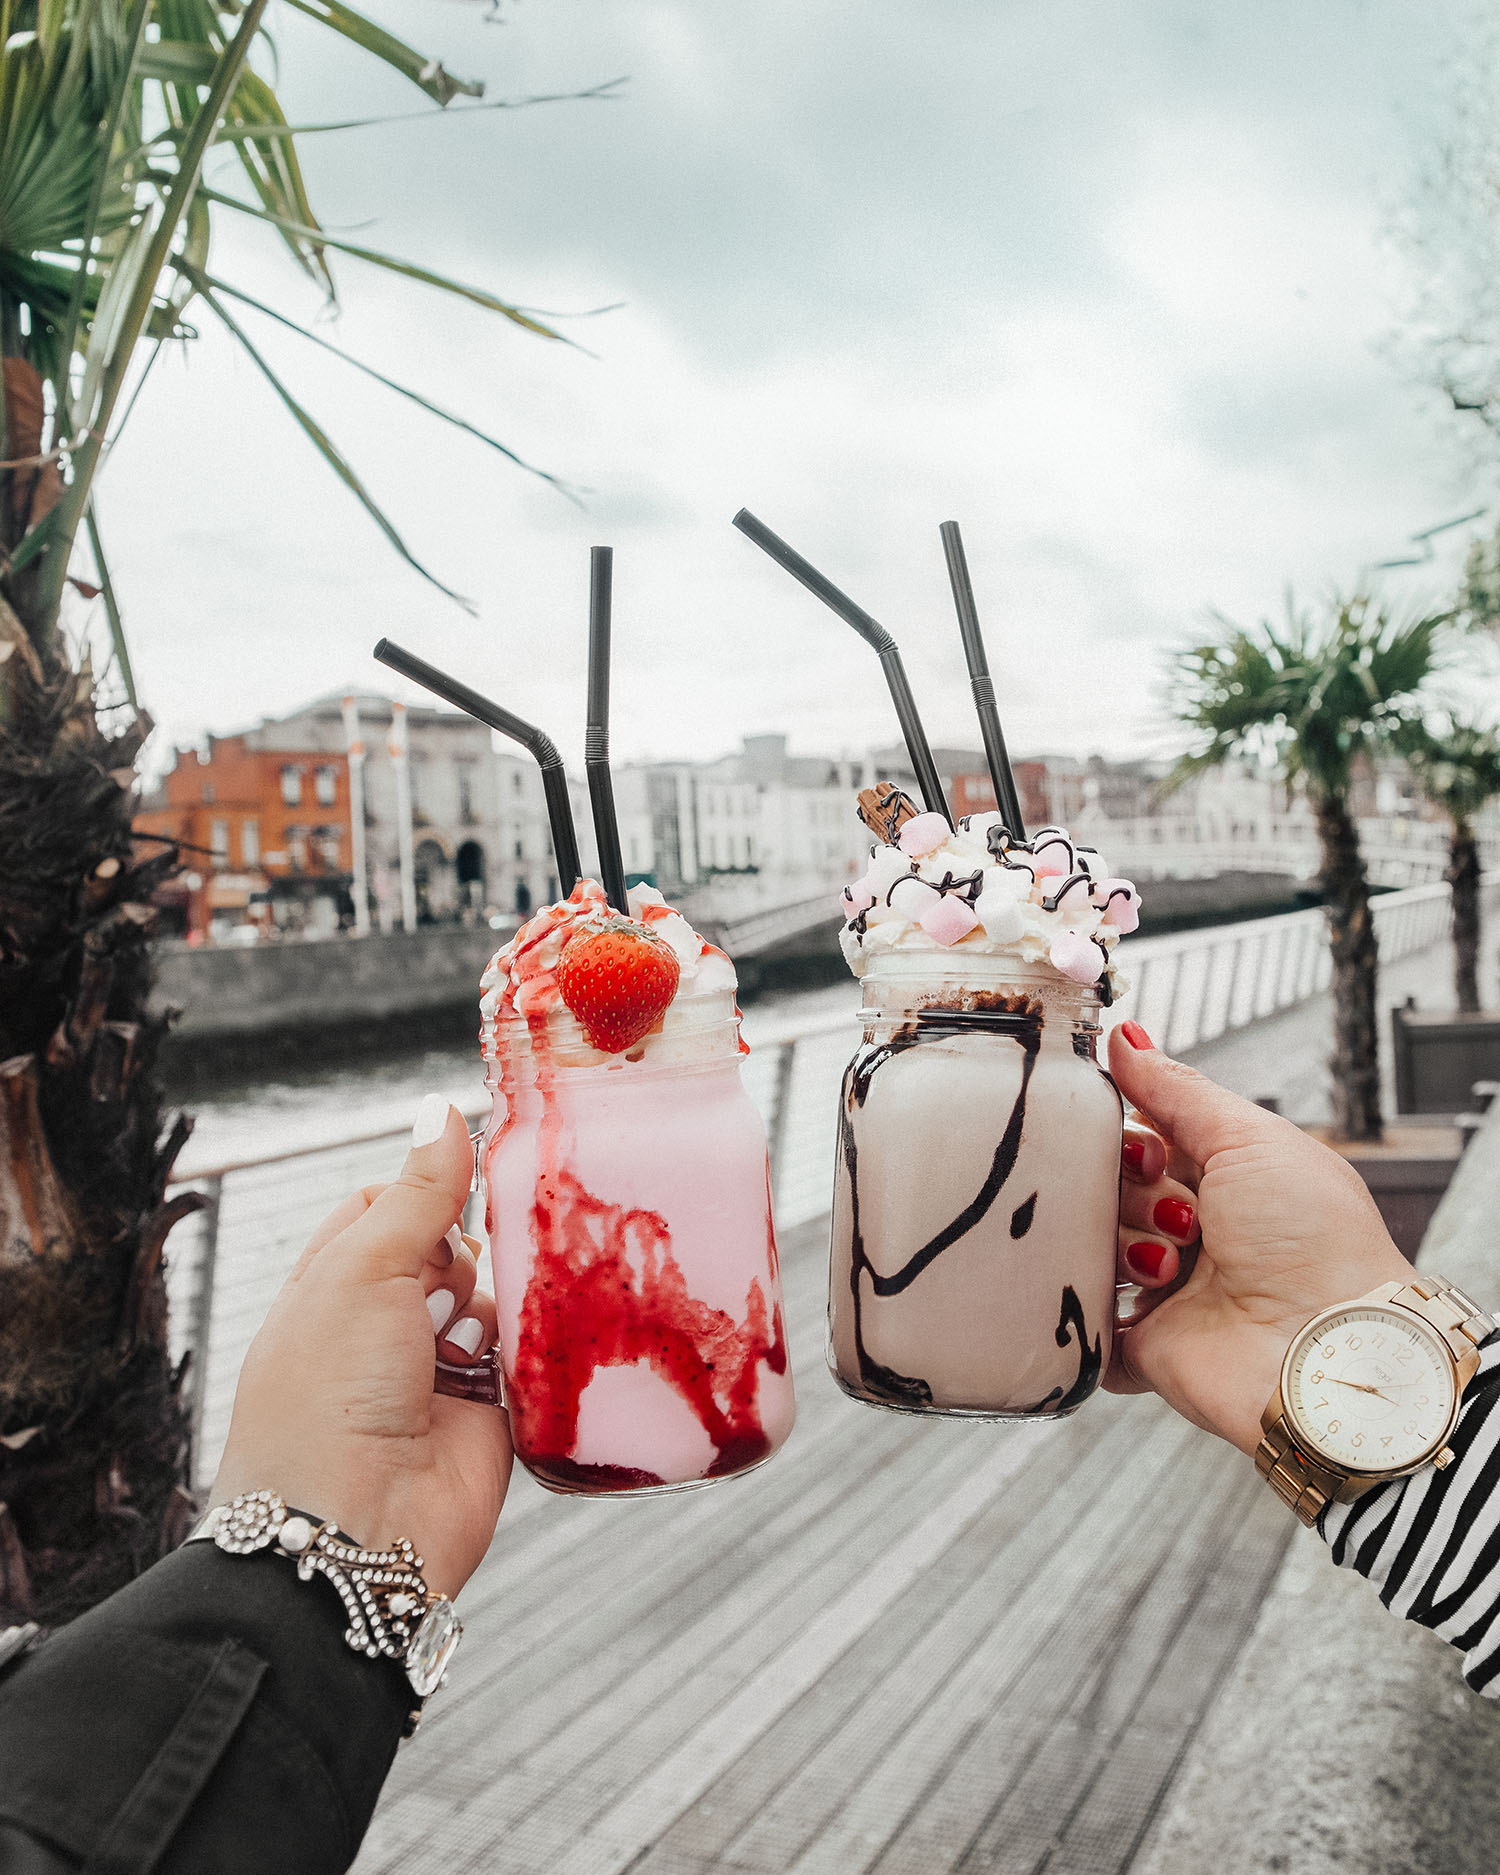 The Sweetest Thing Milkshakes in Dublin